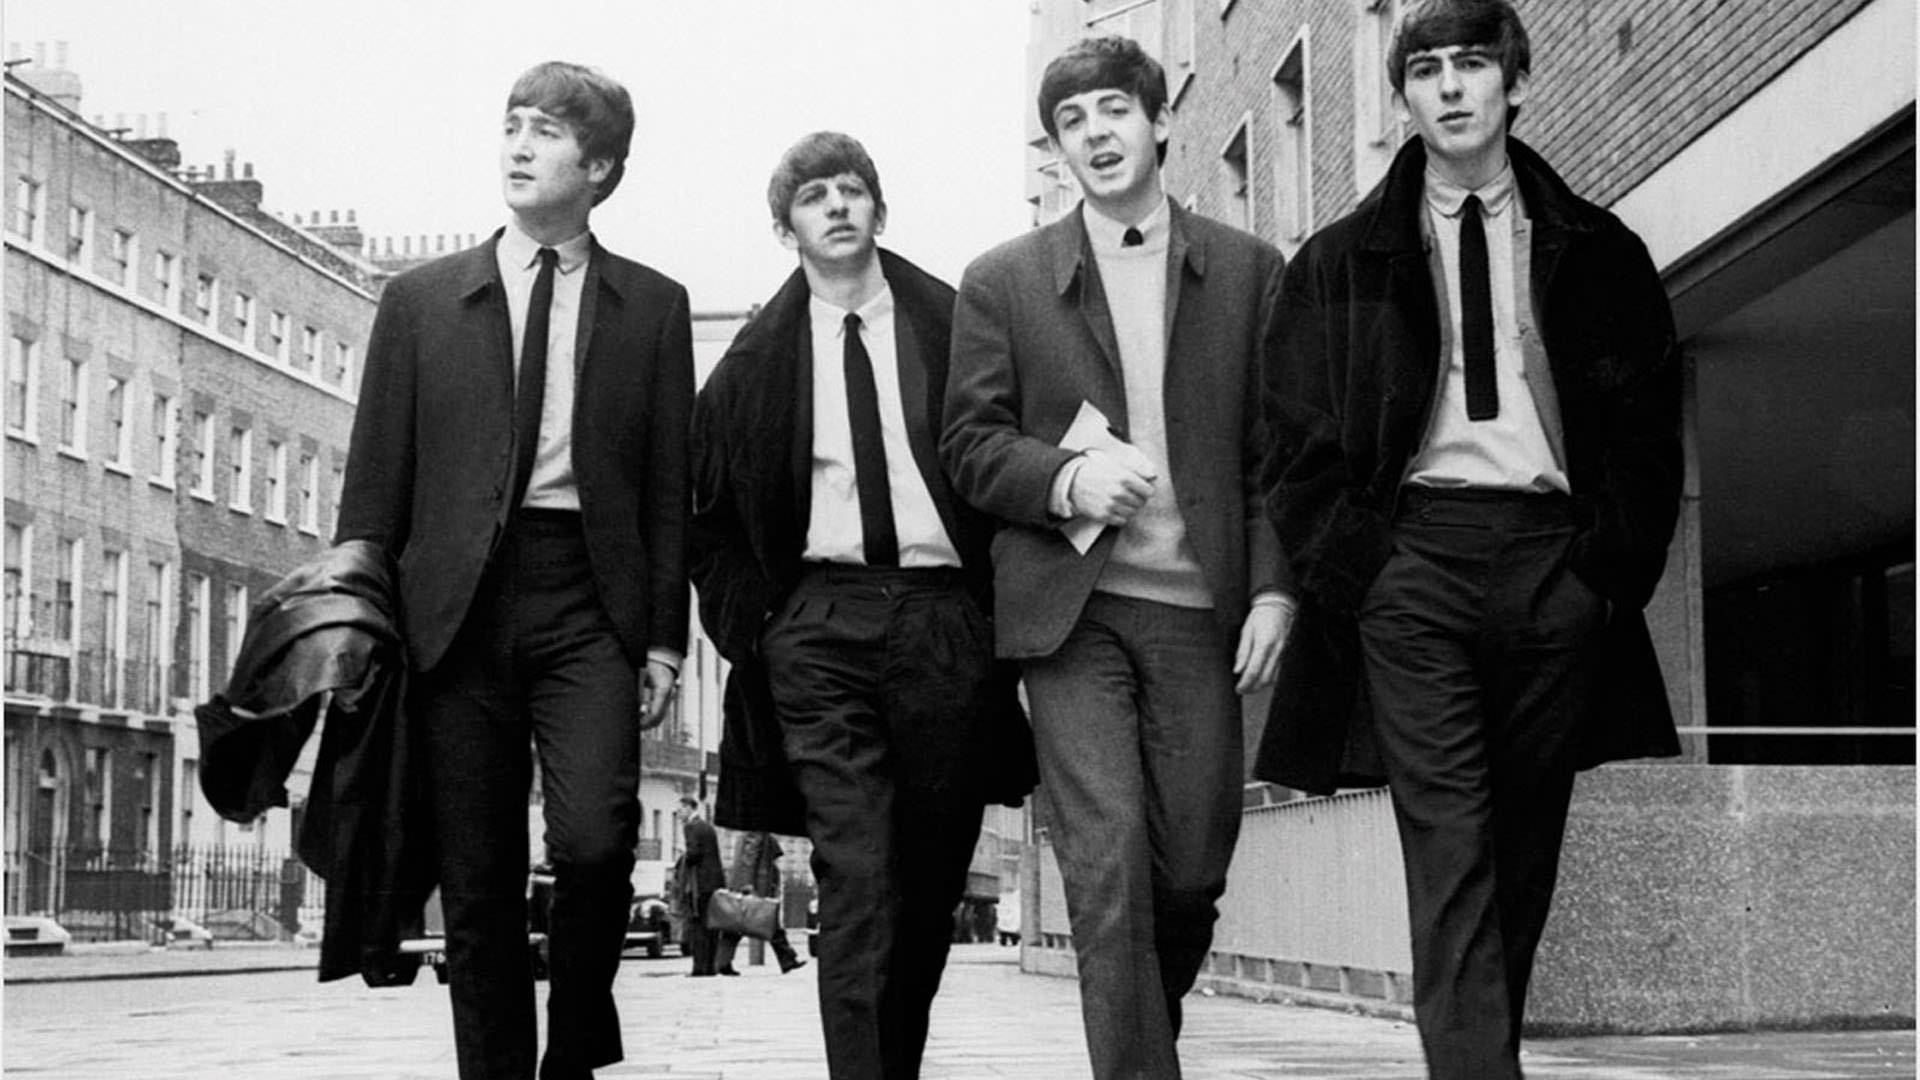 The Beatles z leve proti desni: John Lennon, Ringo Starr, Paul McCartney in George Harrison.